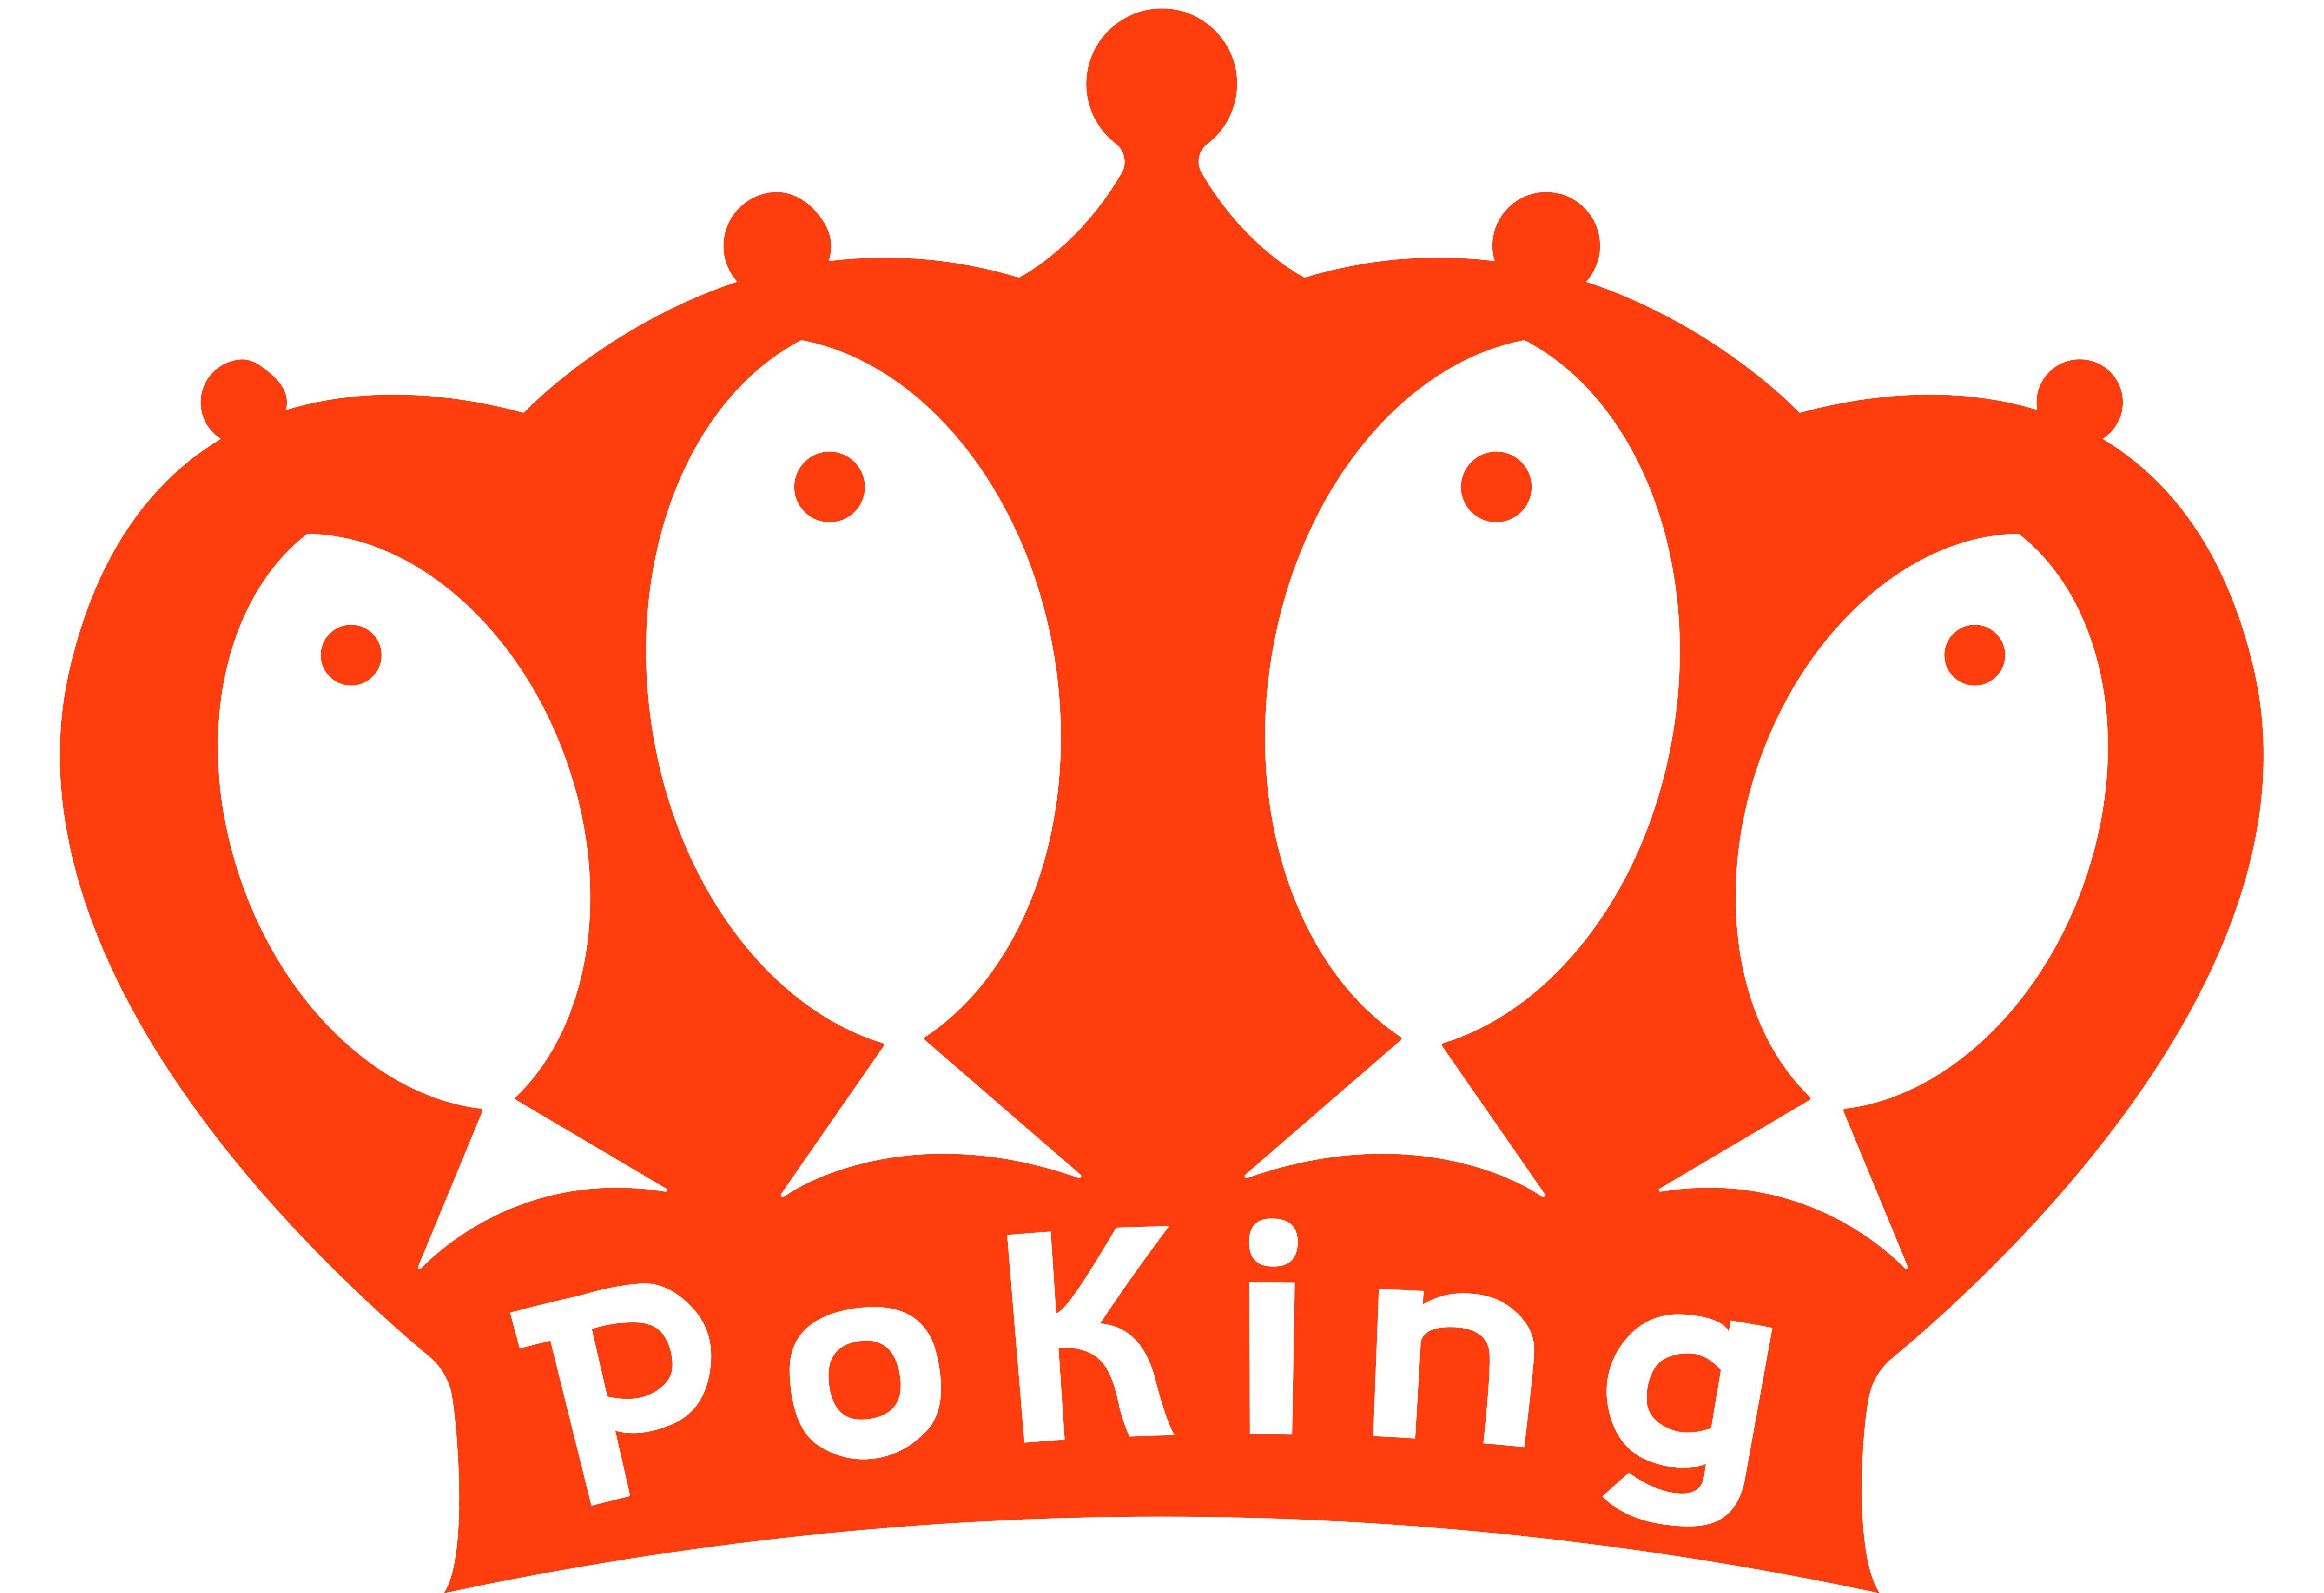 PoKe restaurant logo. Poking, King of Poke